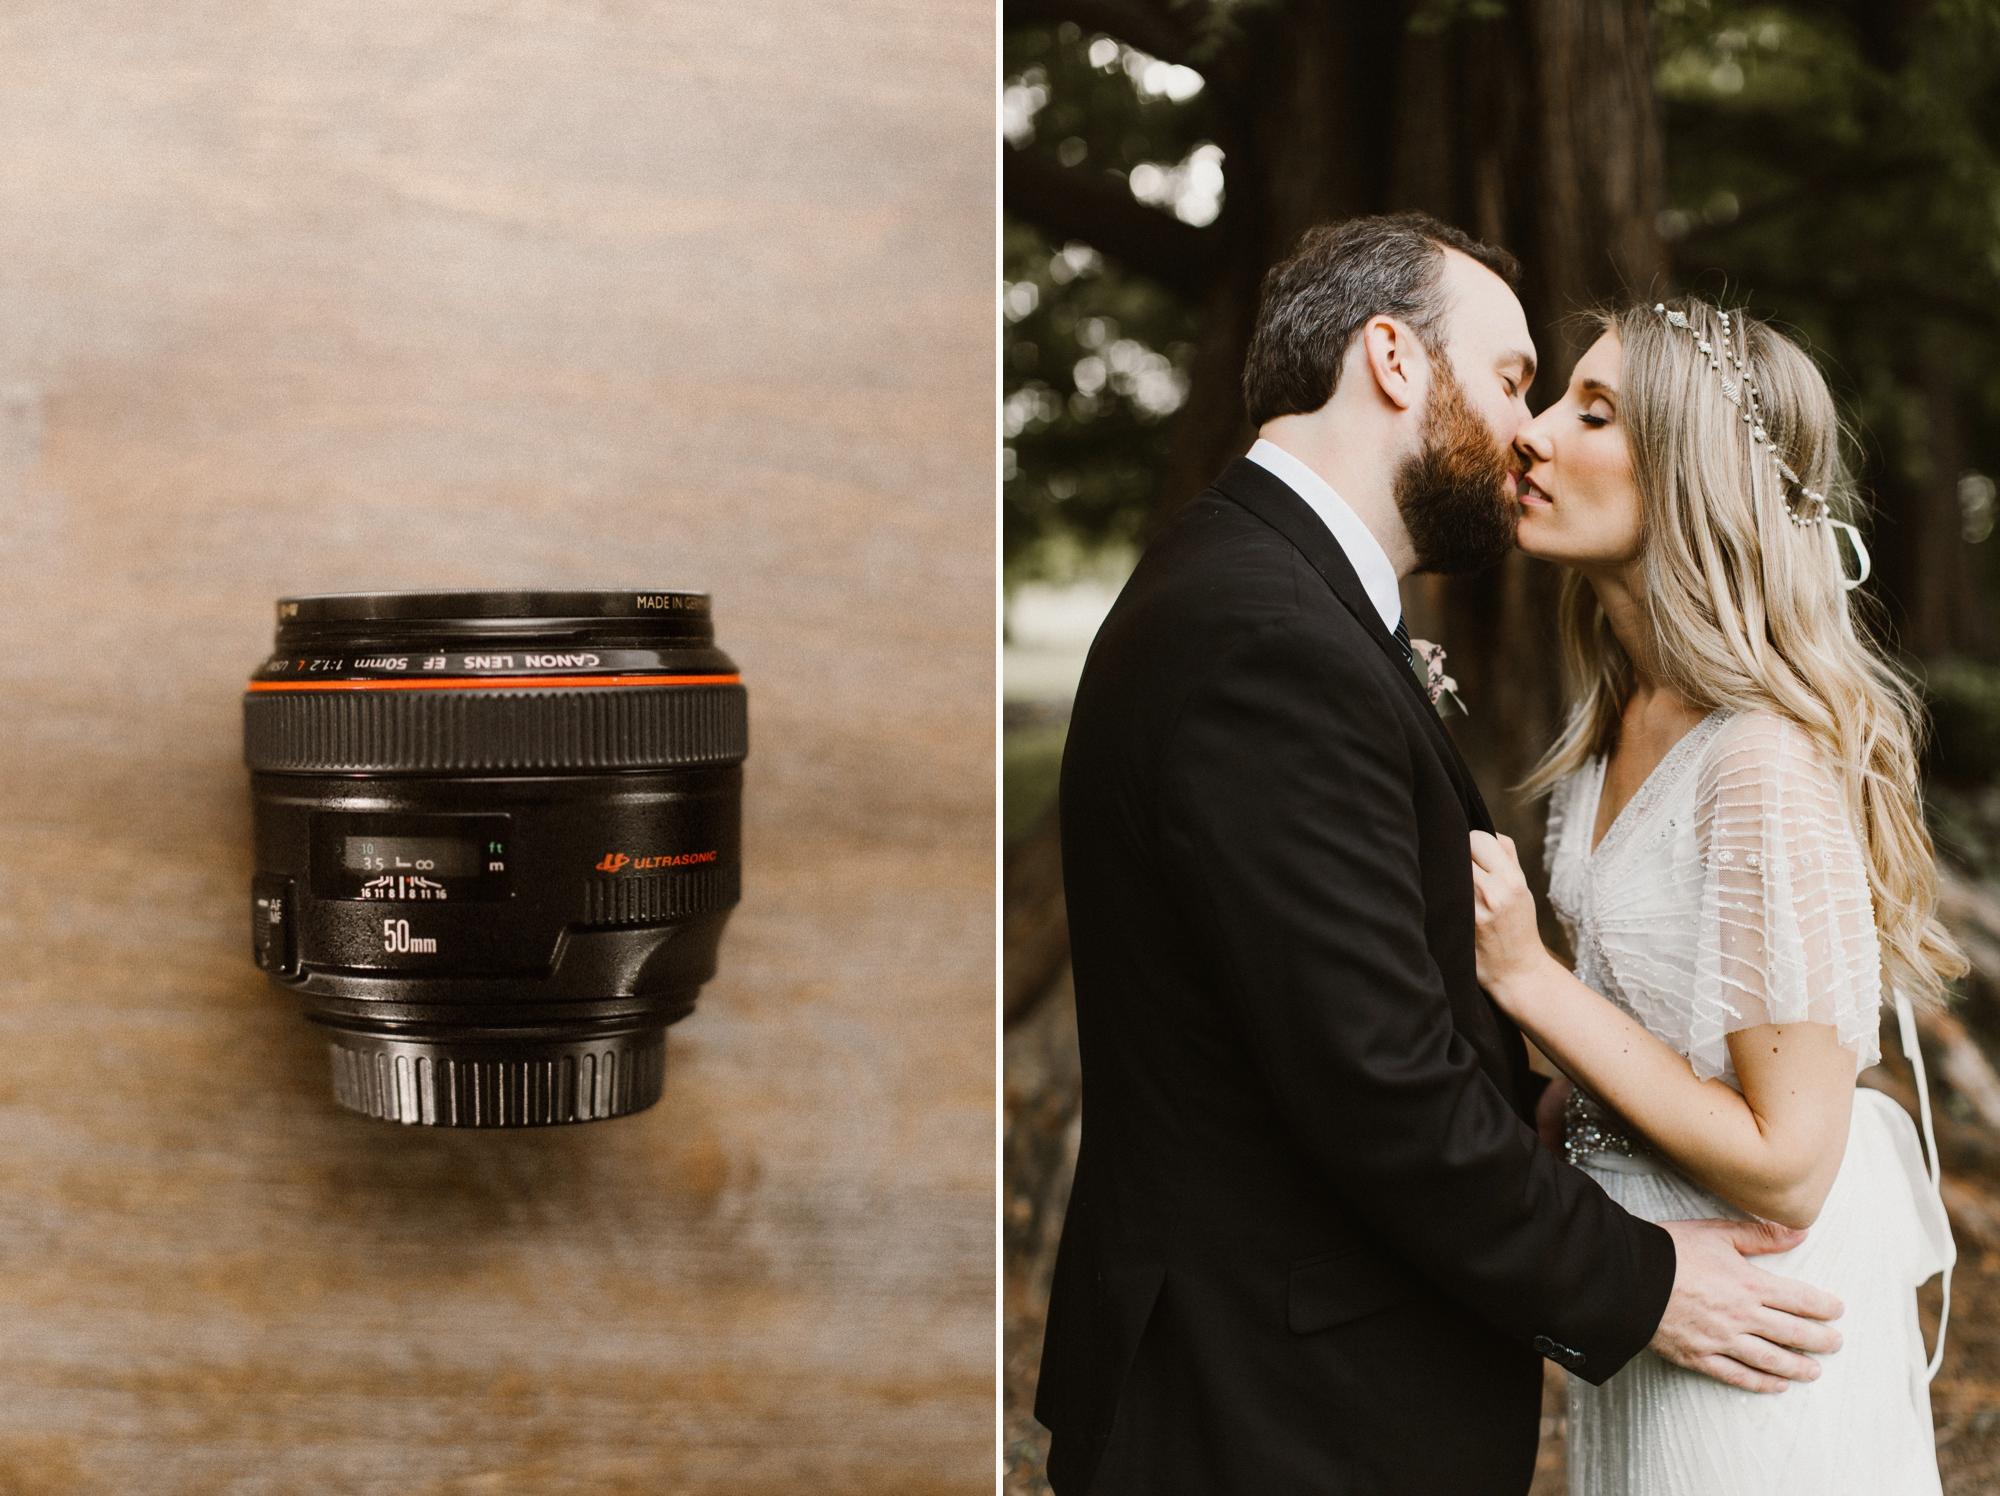 Maryland wedding photographer educational blog post | camera gear bag | best canon lenses for wedding photography